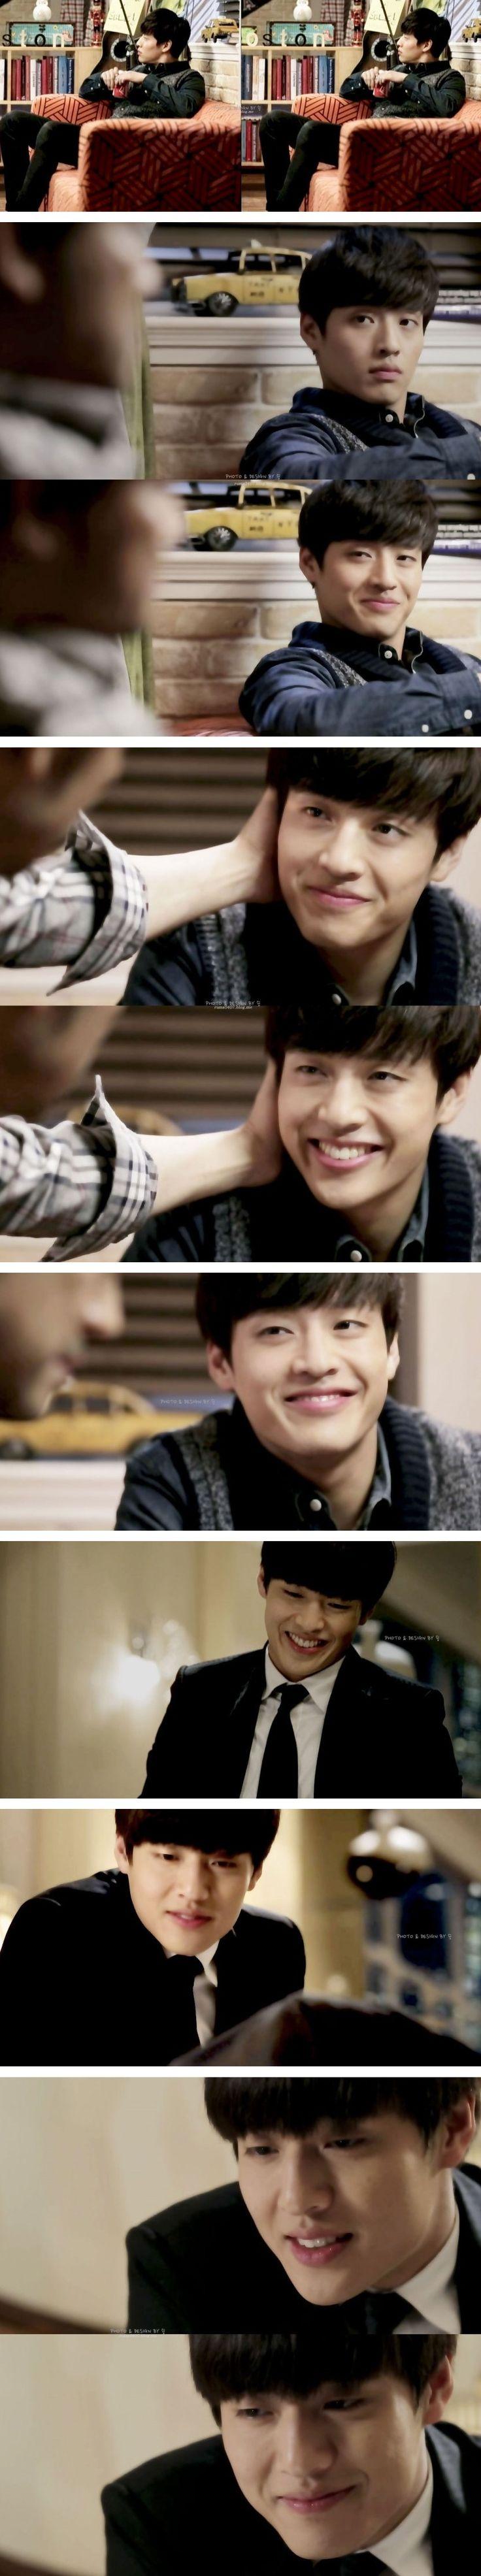 Angel Eyes (엔젤아이즈) Korean - Drama - Episode 4 - Picture @ HanCinema :: The Korean Movie and Drama Database